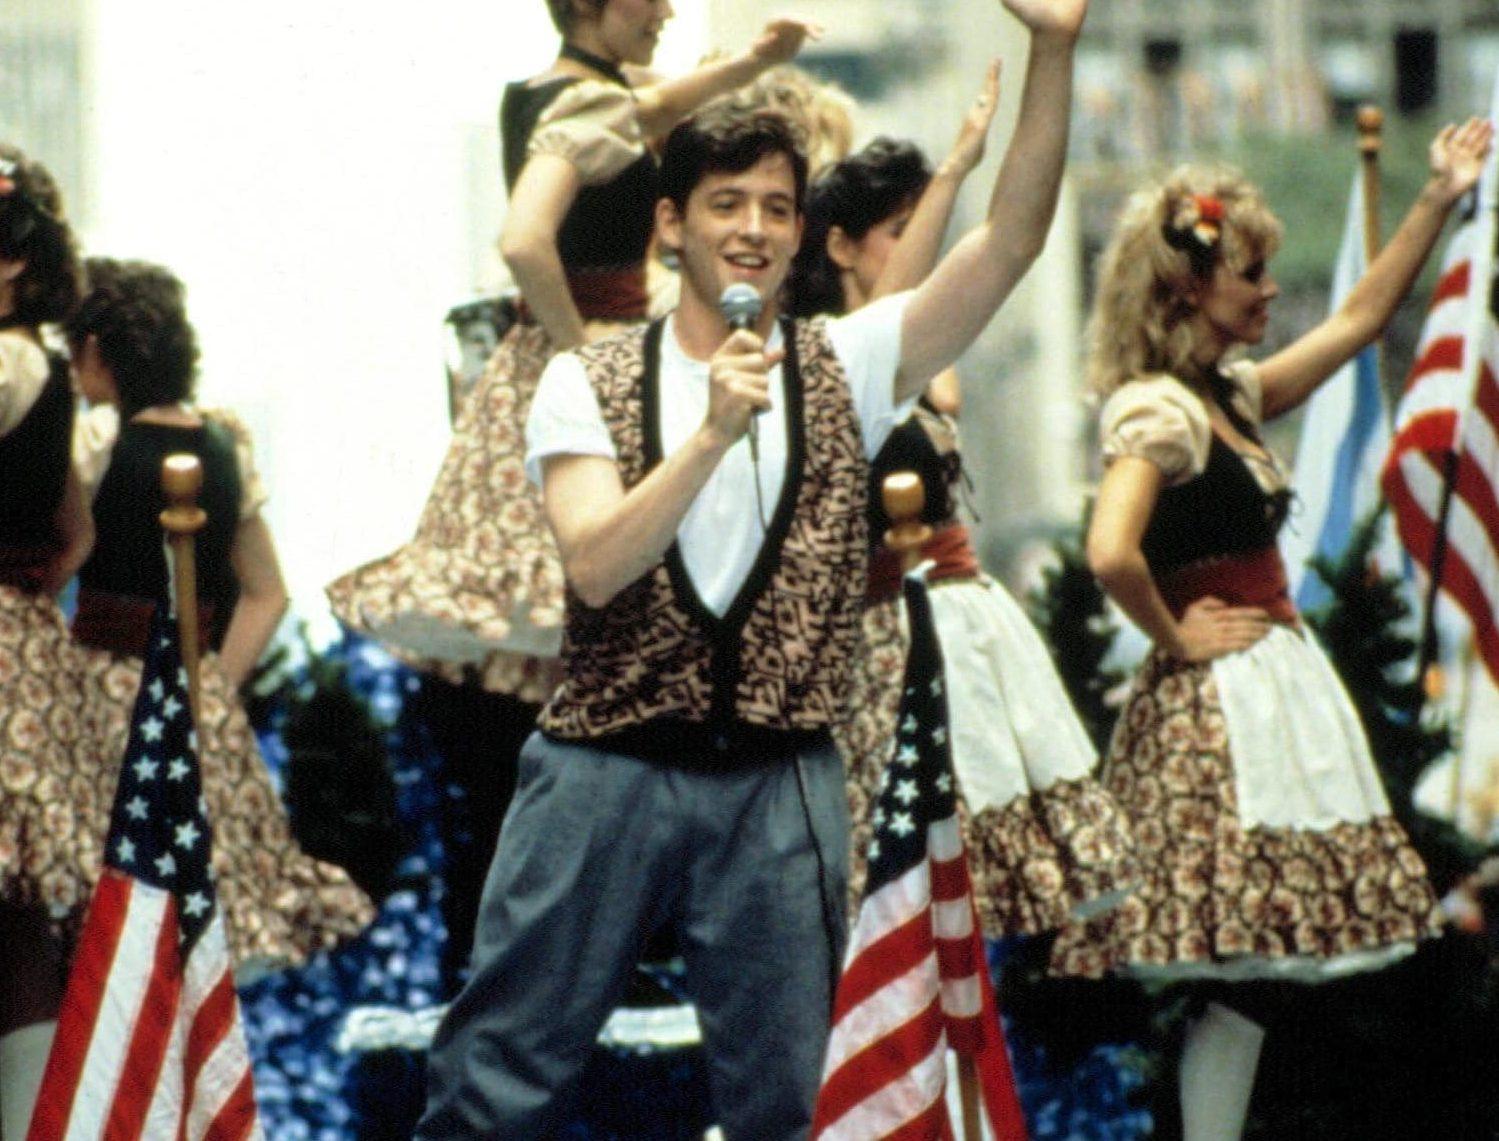 ferris parade trans NvBQzQNjv4Bqeo i u9APj8RuoebjoAHt0k9u7HhRJvuo ZLenGRumA e1617029161659 20 Things You Probably Didn't Know About Ferris Bueller's Day Off